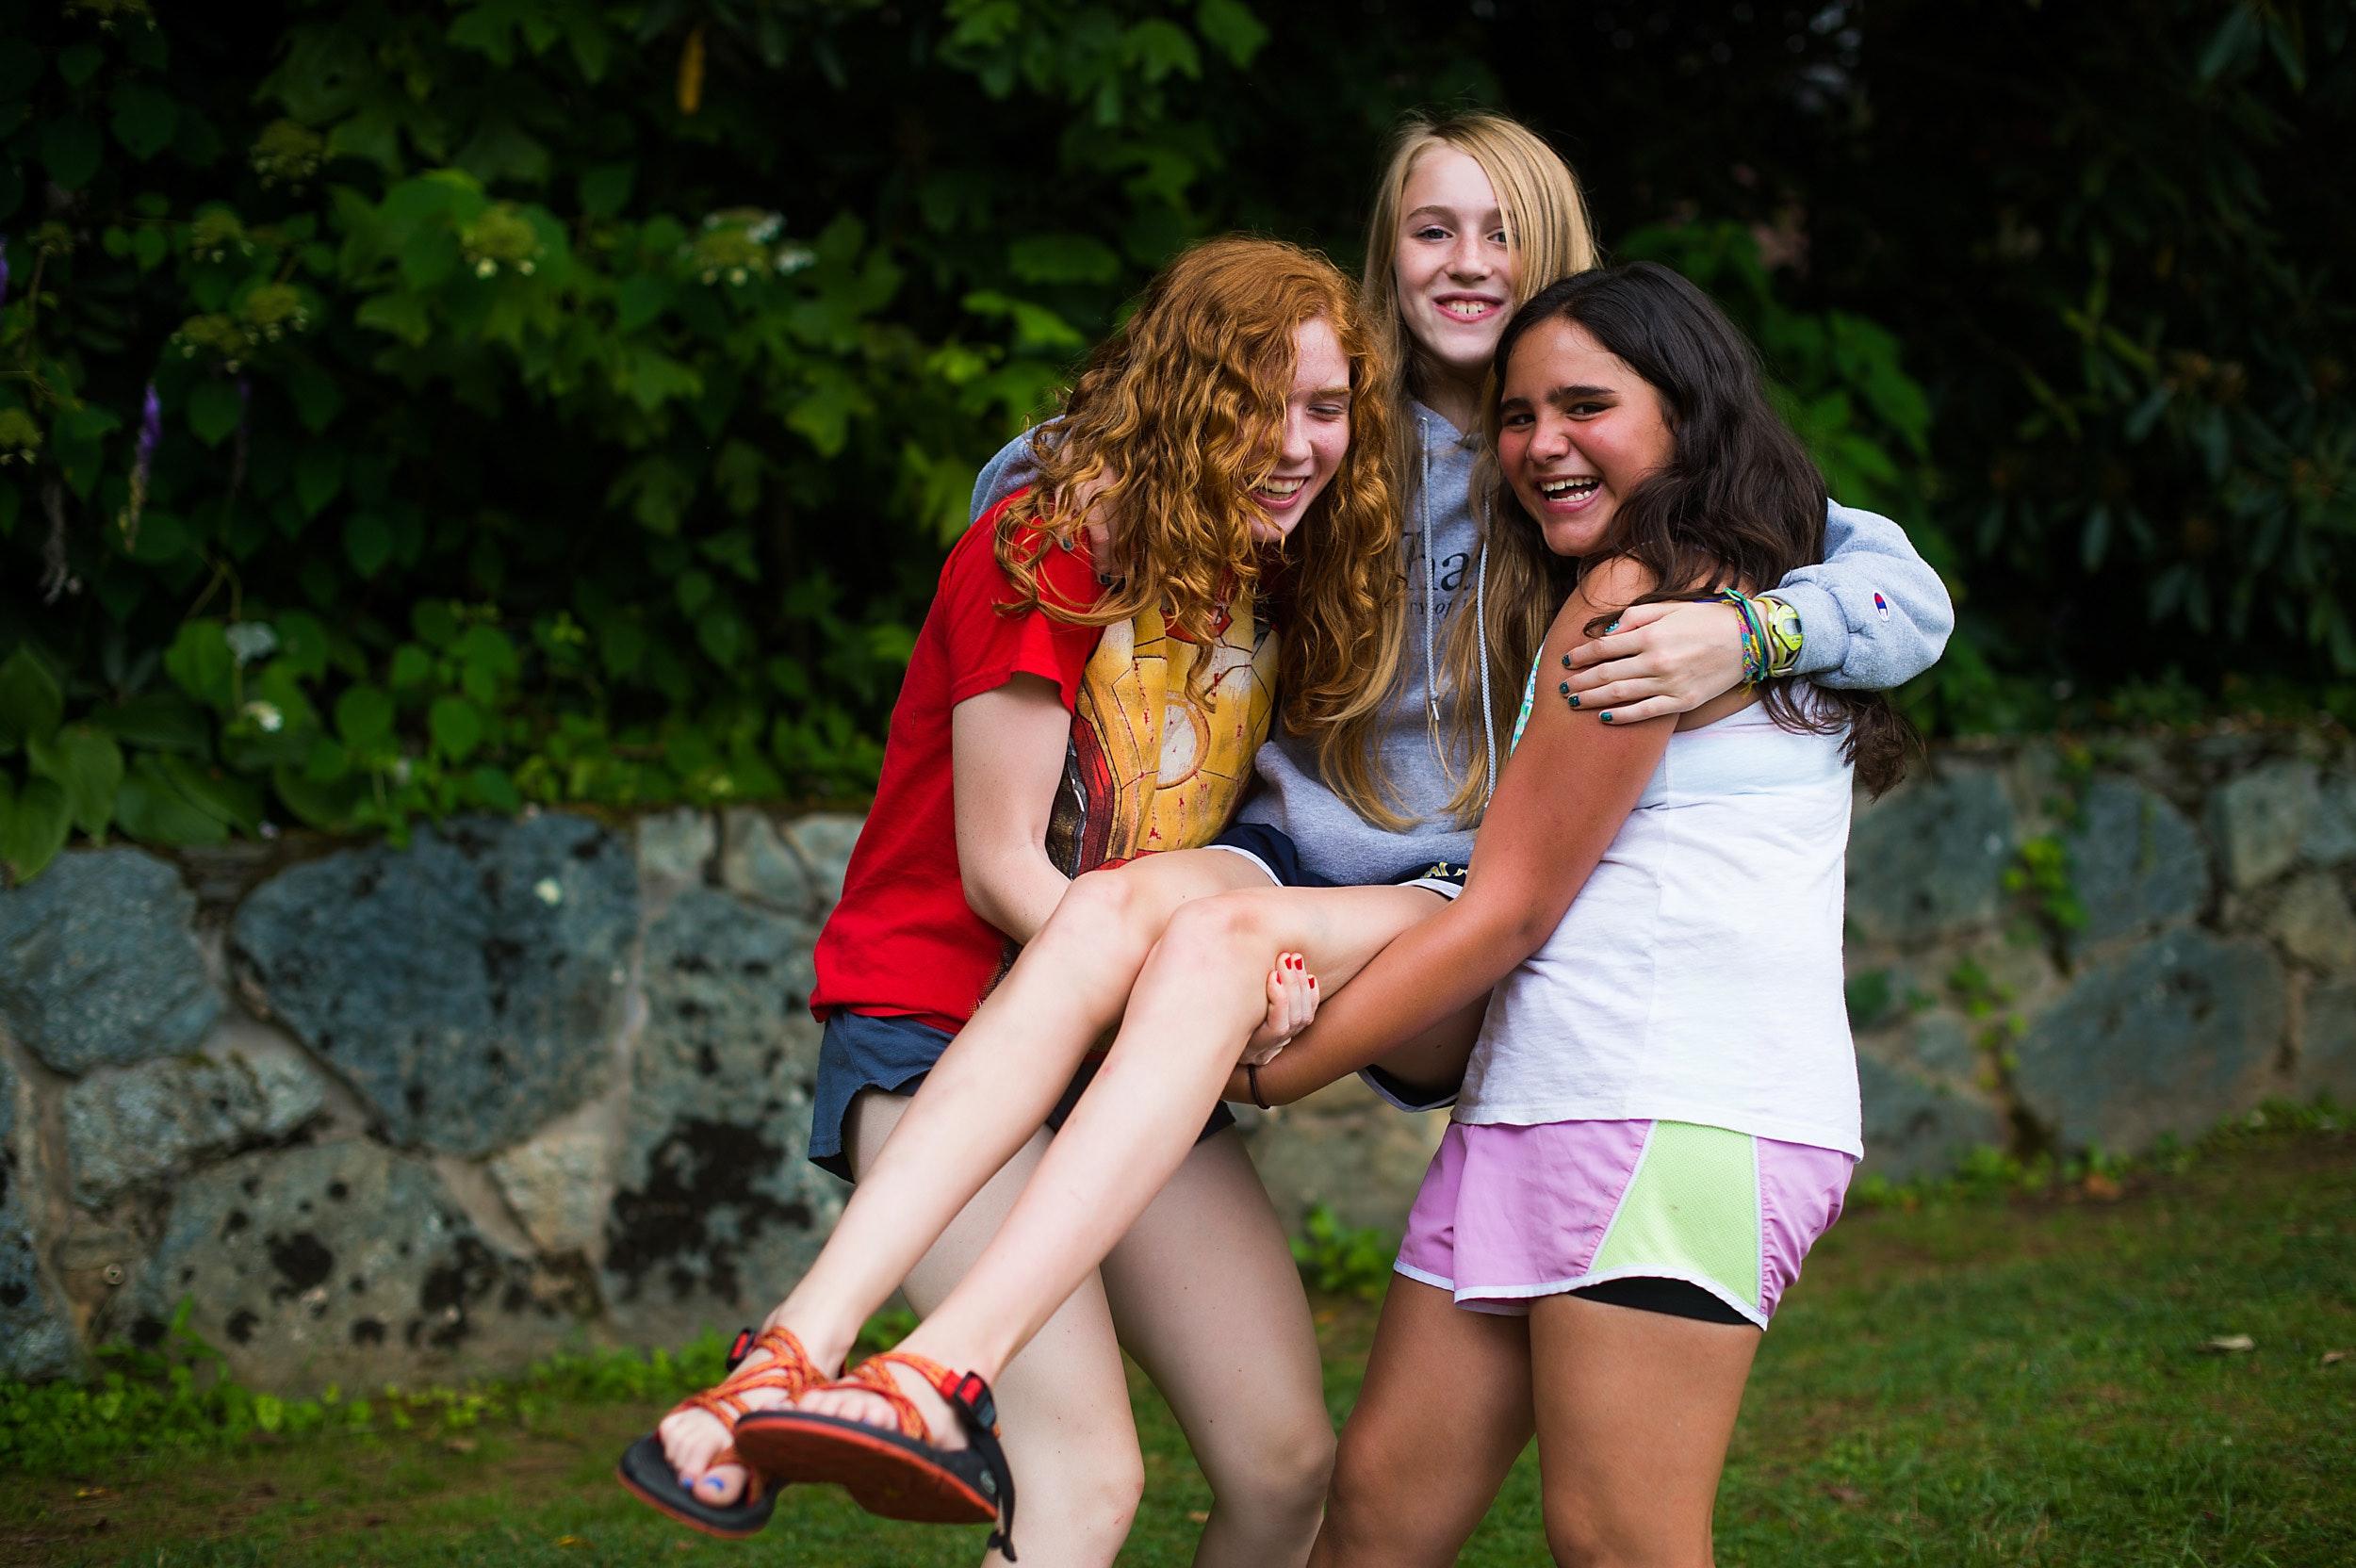 Friends playing at keystone summer camp for girls in north carolina.jpg?ixlib=rails 2.1